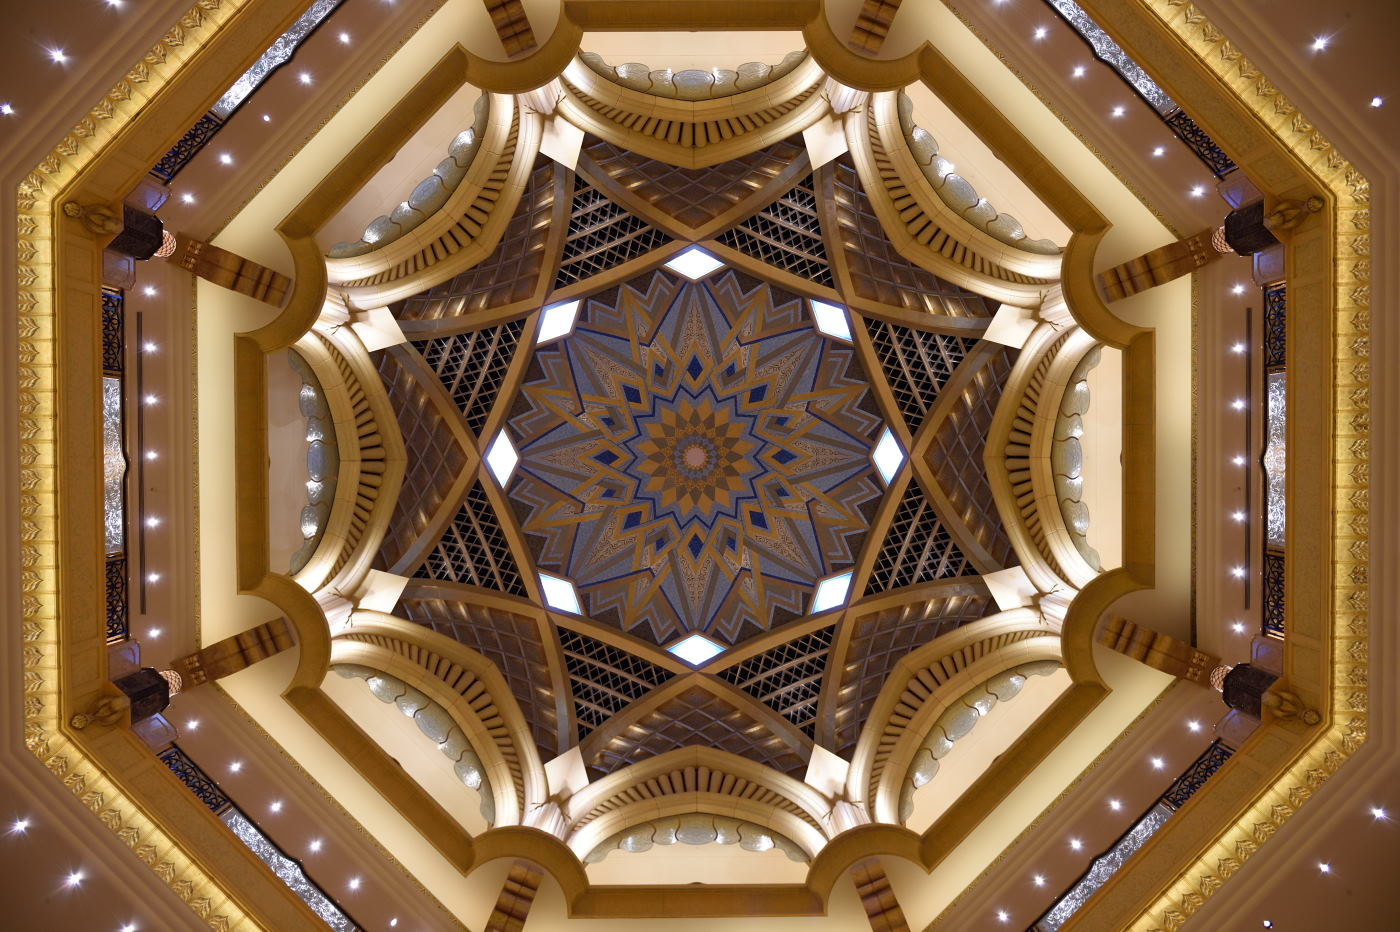 Фотография 2. Потолок во дворце Эмирейтс-Палас. 1/25, 2.8, 360, 24. Съемка на камеру Никон Д4с и объектив Никон 24-70/2,8.